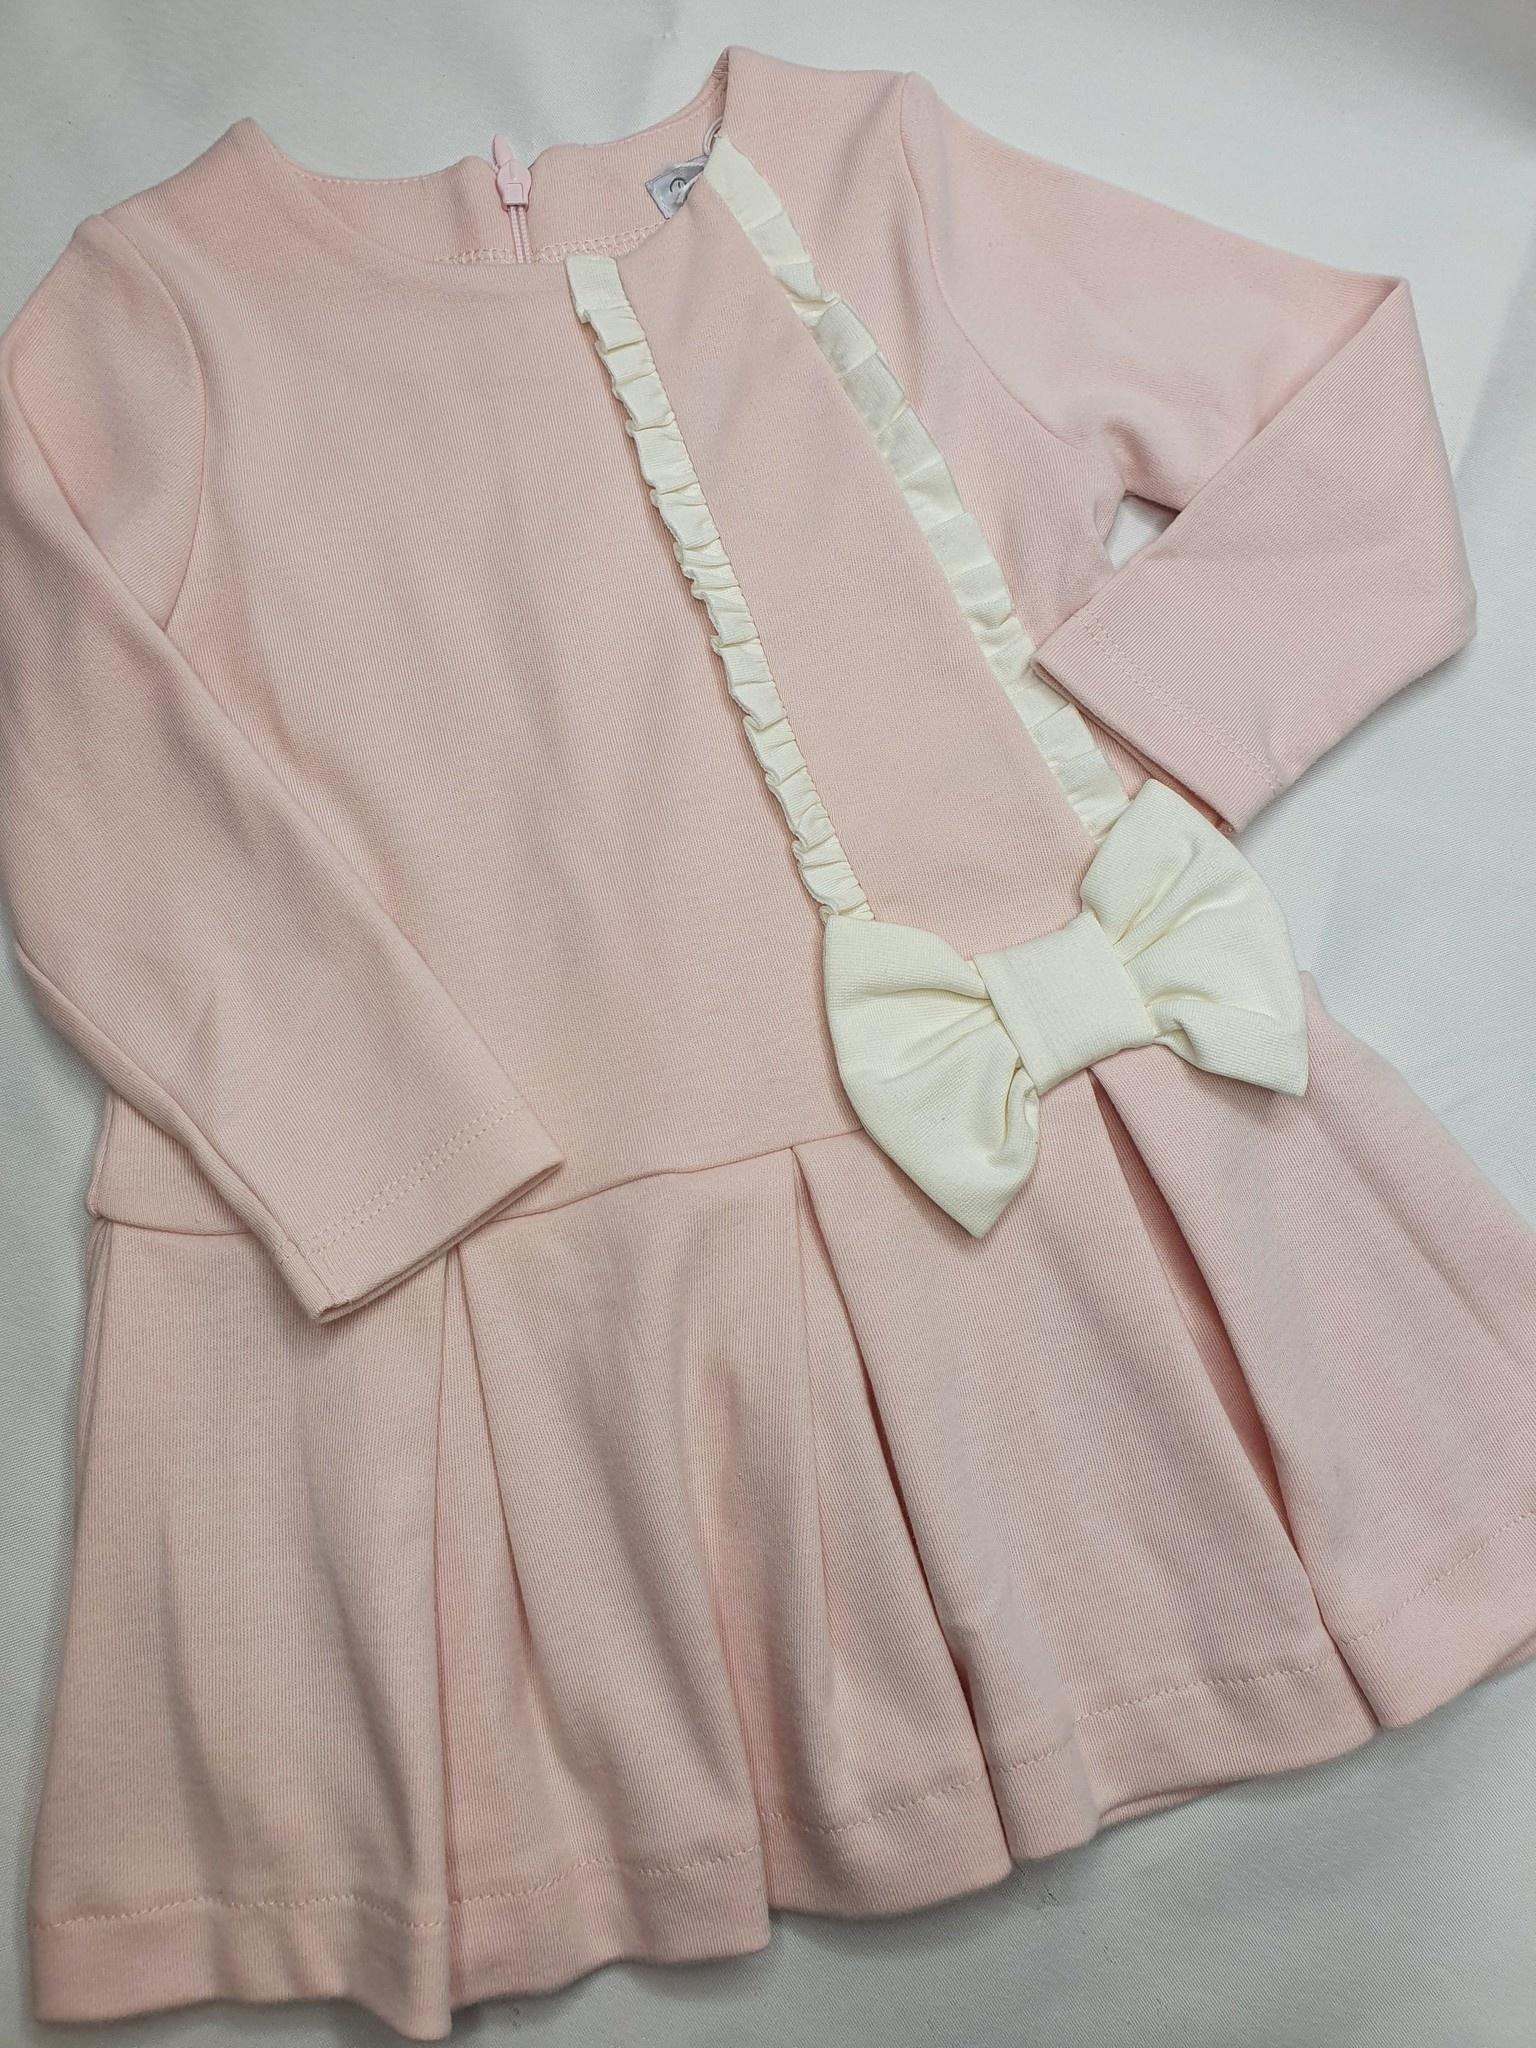 Patachou Patachou Pink Knit Dress